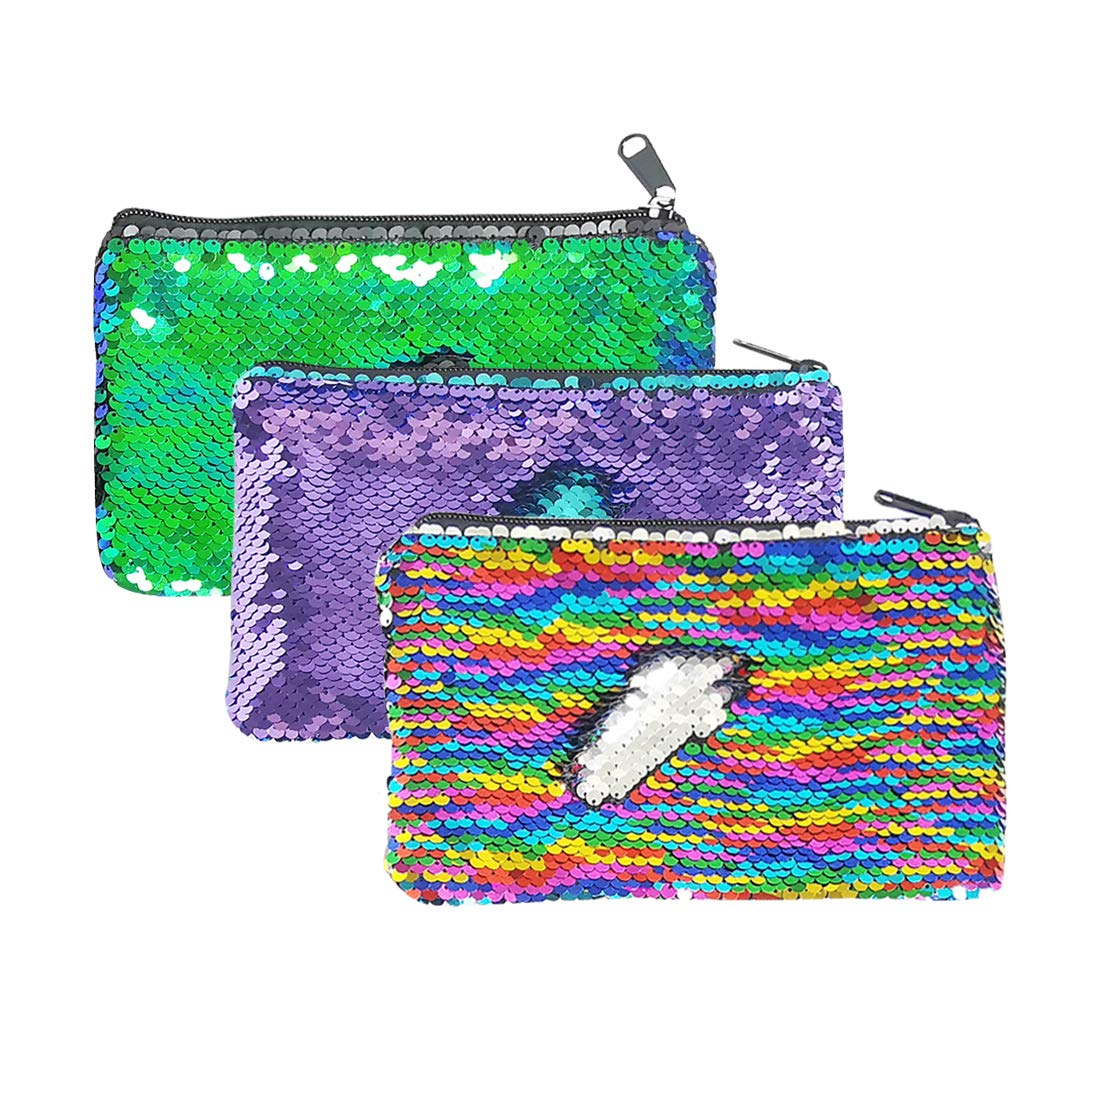 SEQ-M Mini Plat Paillettes-per pack